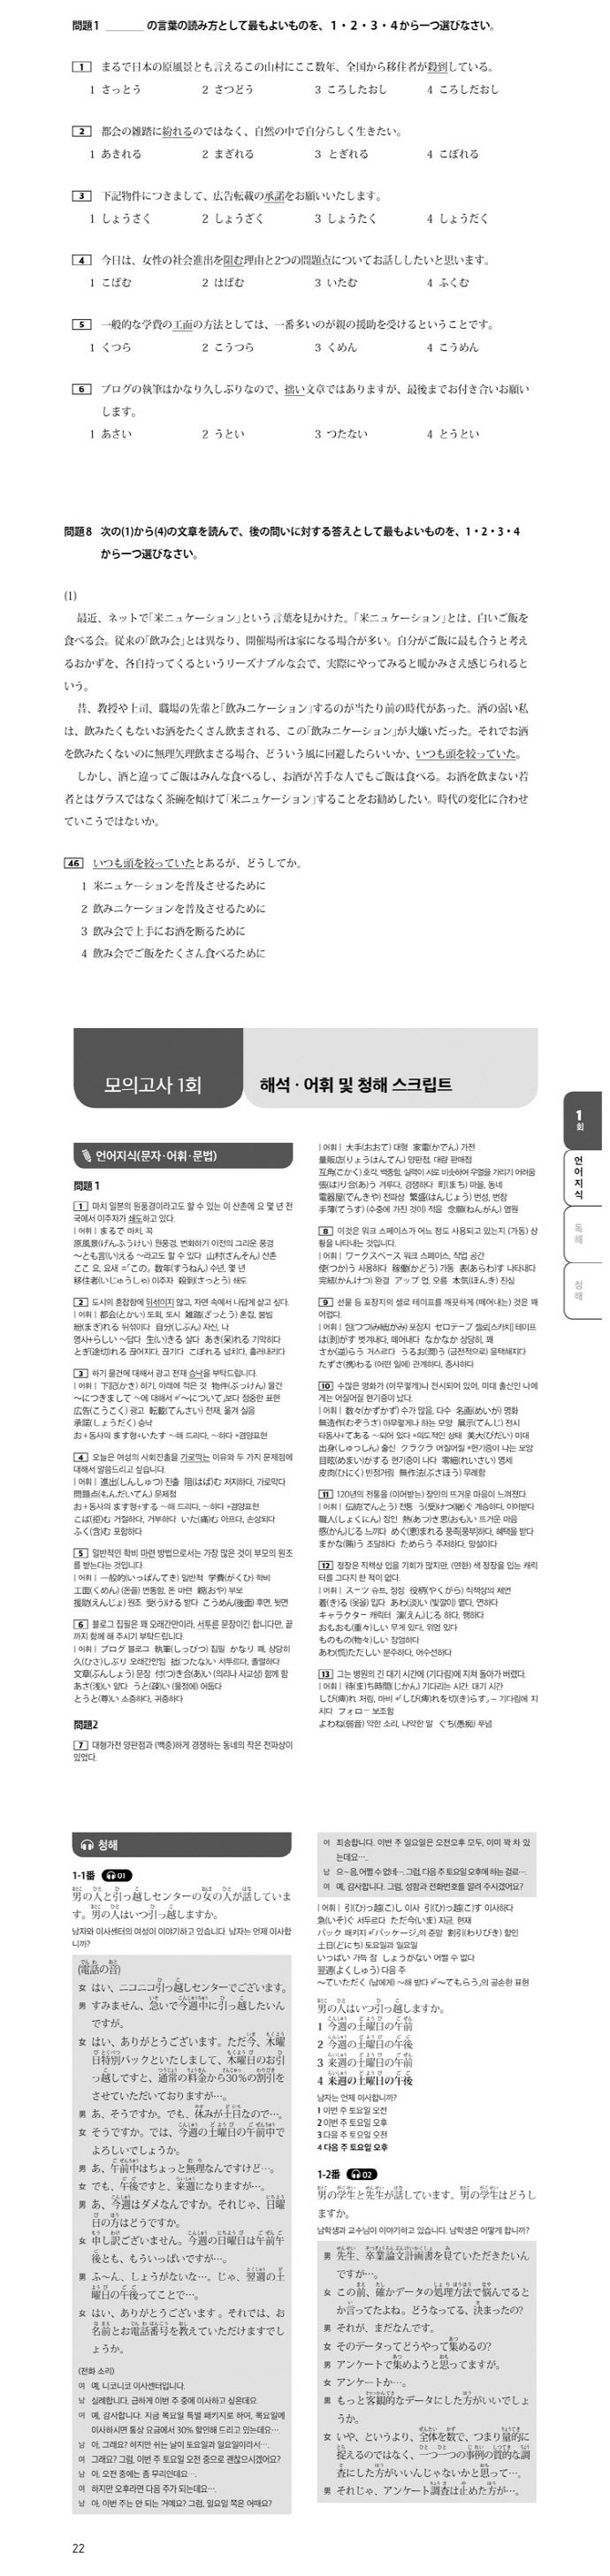 JLPT N1 모의고사 단기완성 2회분 도서 상세이미지